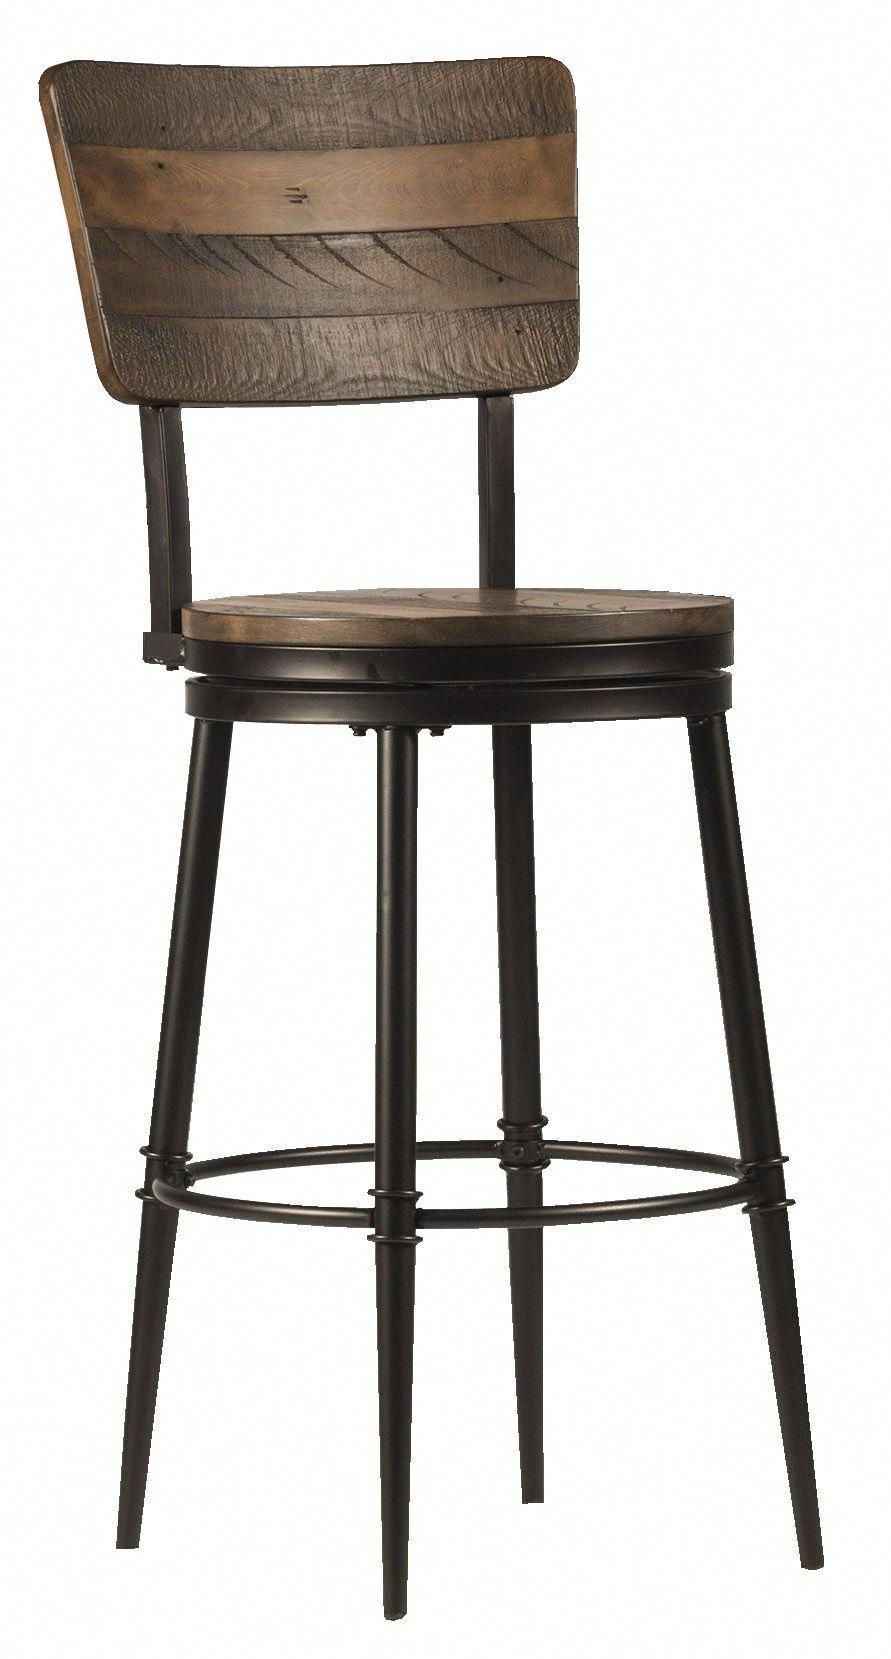 Jennings Swivel Barstool Frontroom Furnishings Interiorremodel Bar Stools Bar Stools Kitchen Island Wood Bar Stools